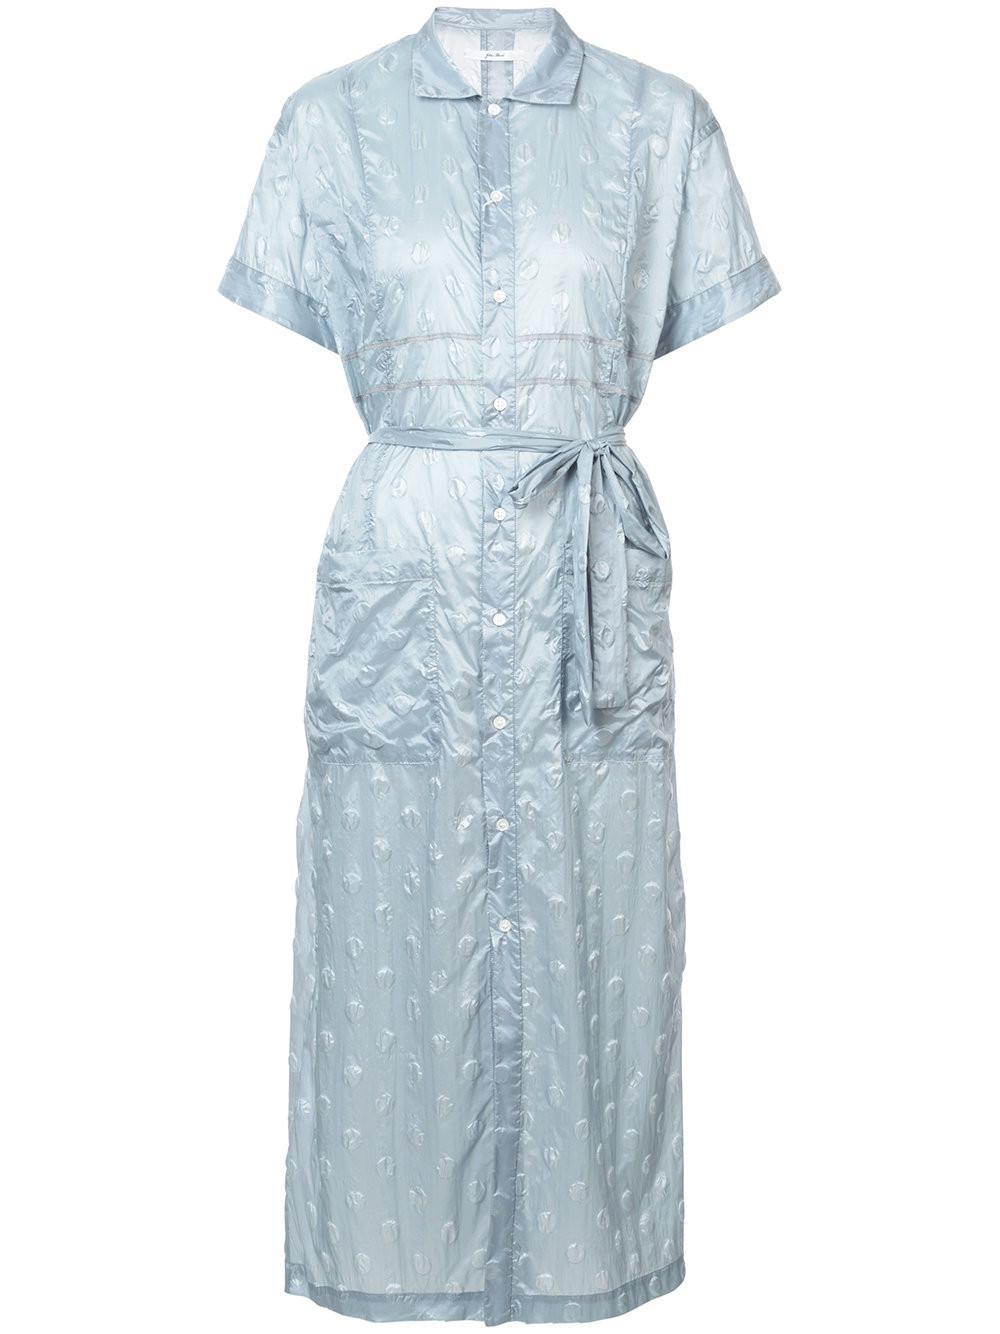 f0213f2df1f082 Lyst - Julien David Crinkled Polka Dot Shirt Dress in Blue - Save 43%